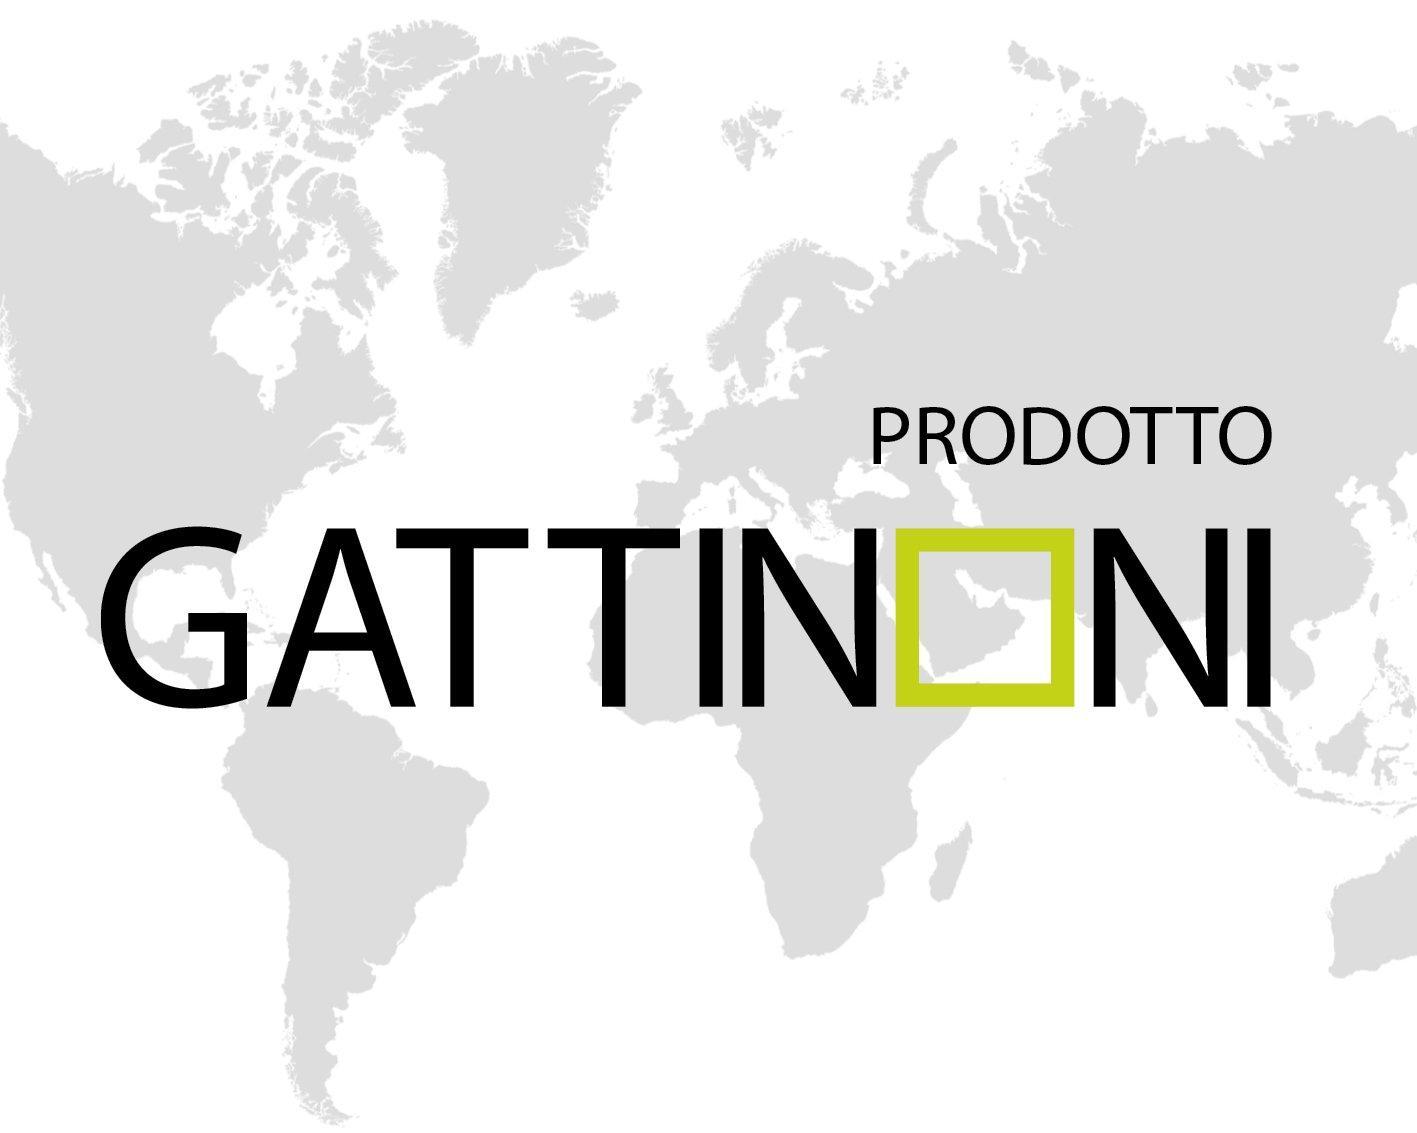 TH Pila Valle d'Aosta - GATTINONI,